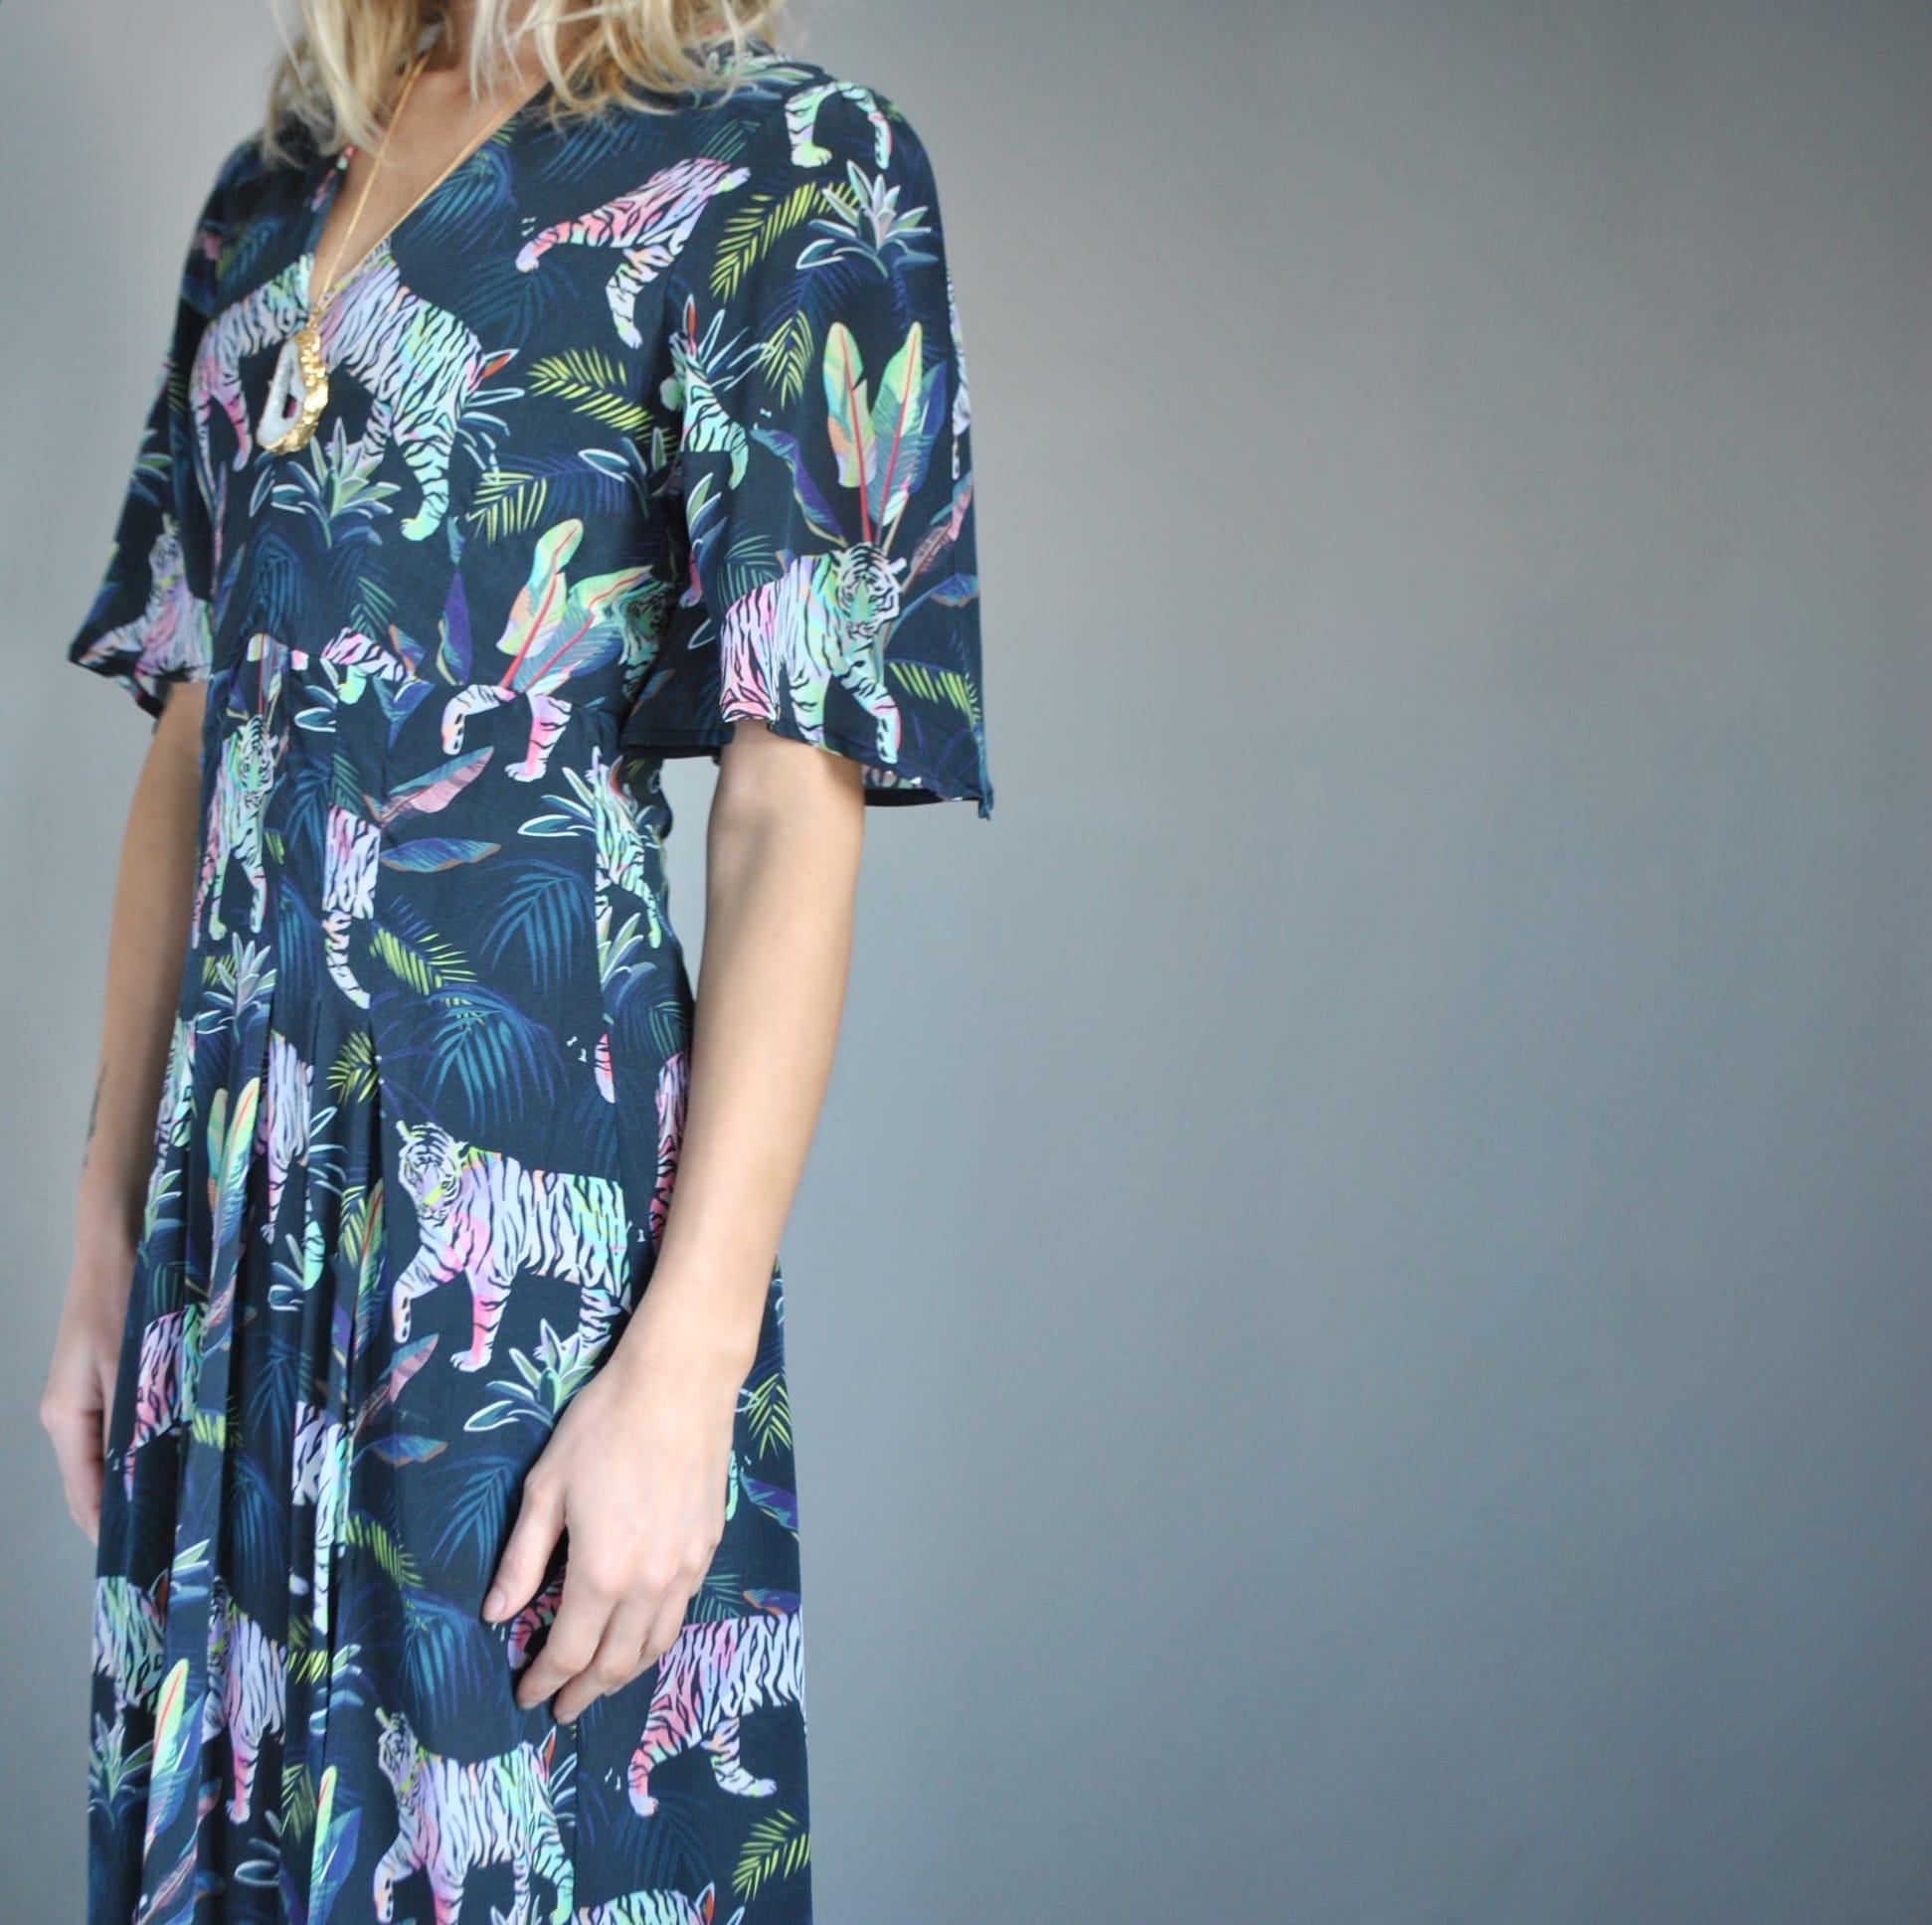 Pyrus-tiger-dress